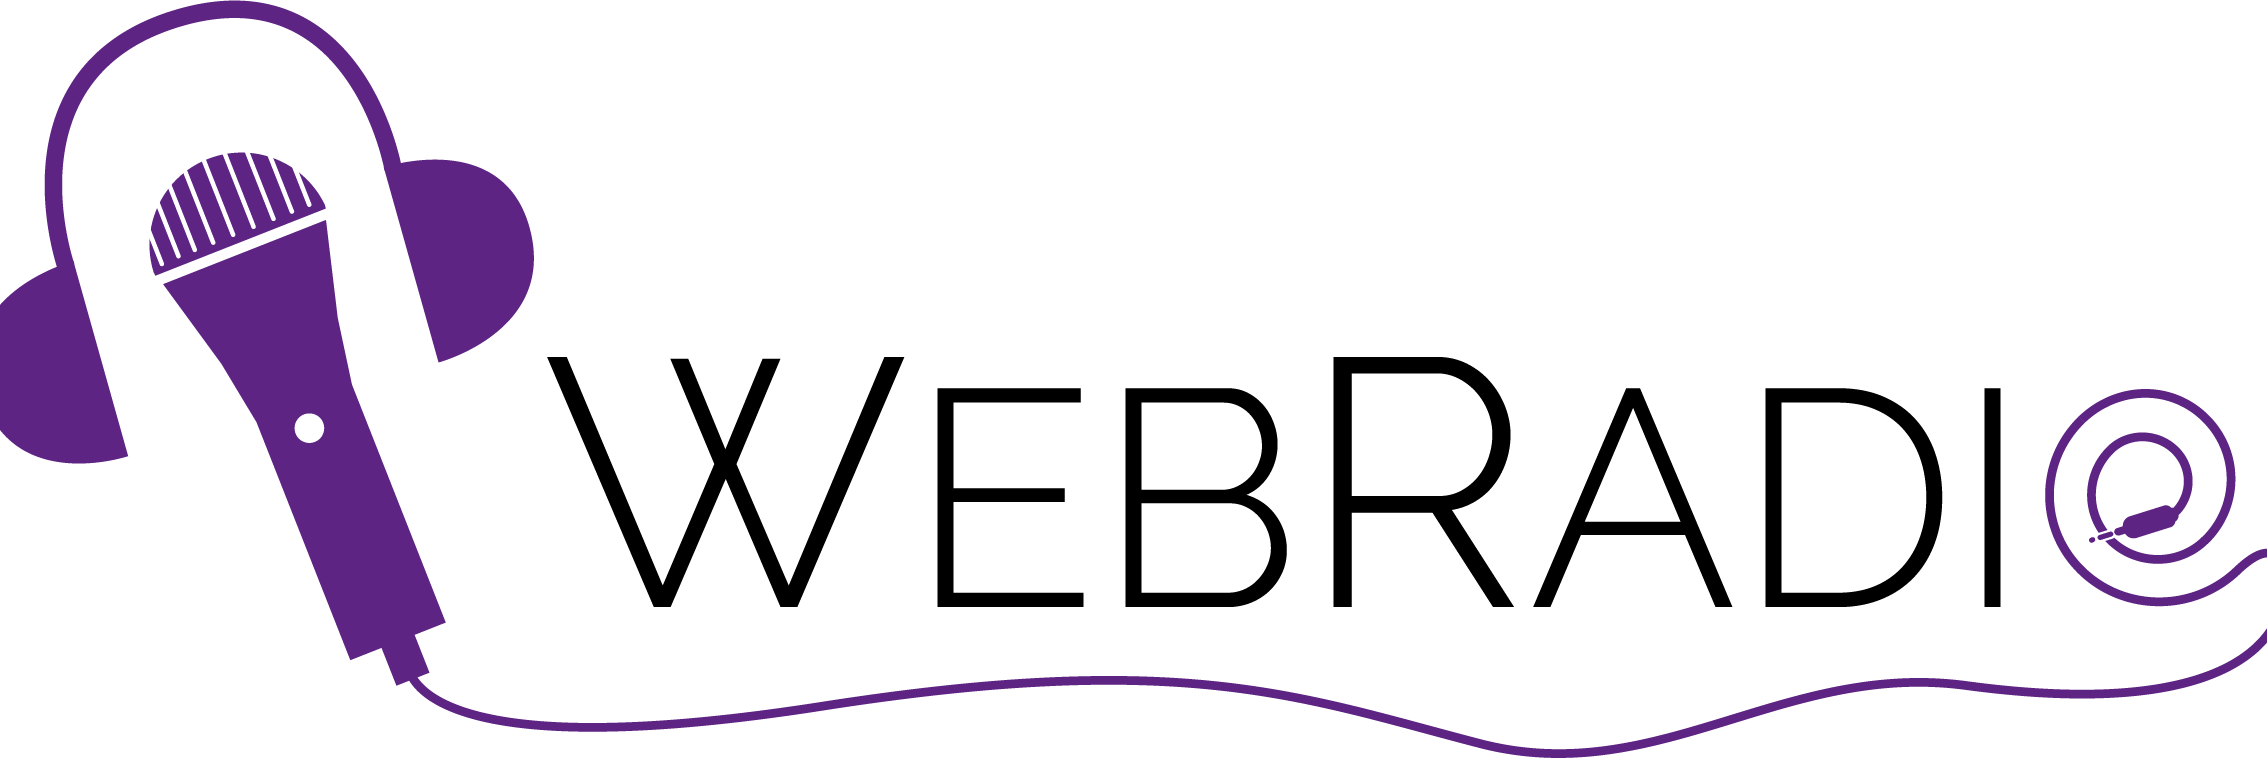 Logo-final-webradio.png